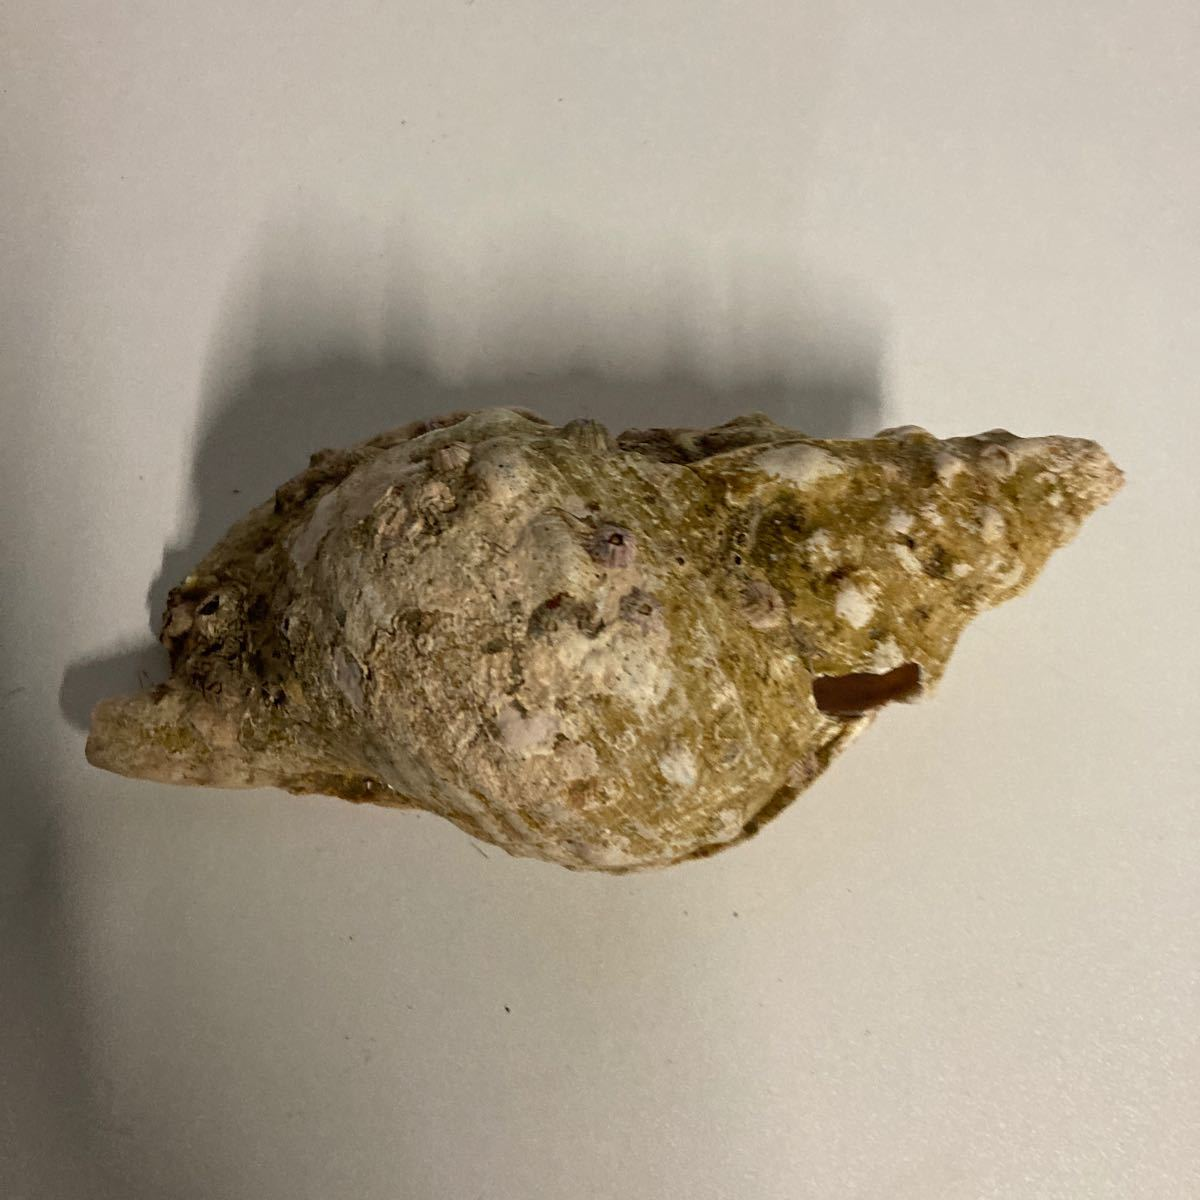 貝殻 貝標本 天然貝殻 貝殻標本 ホラガイ?2_画像5